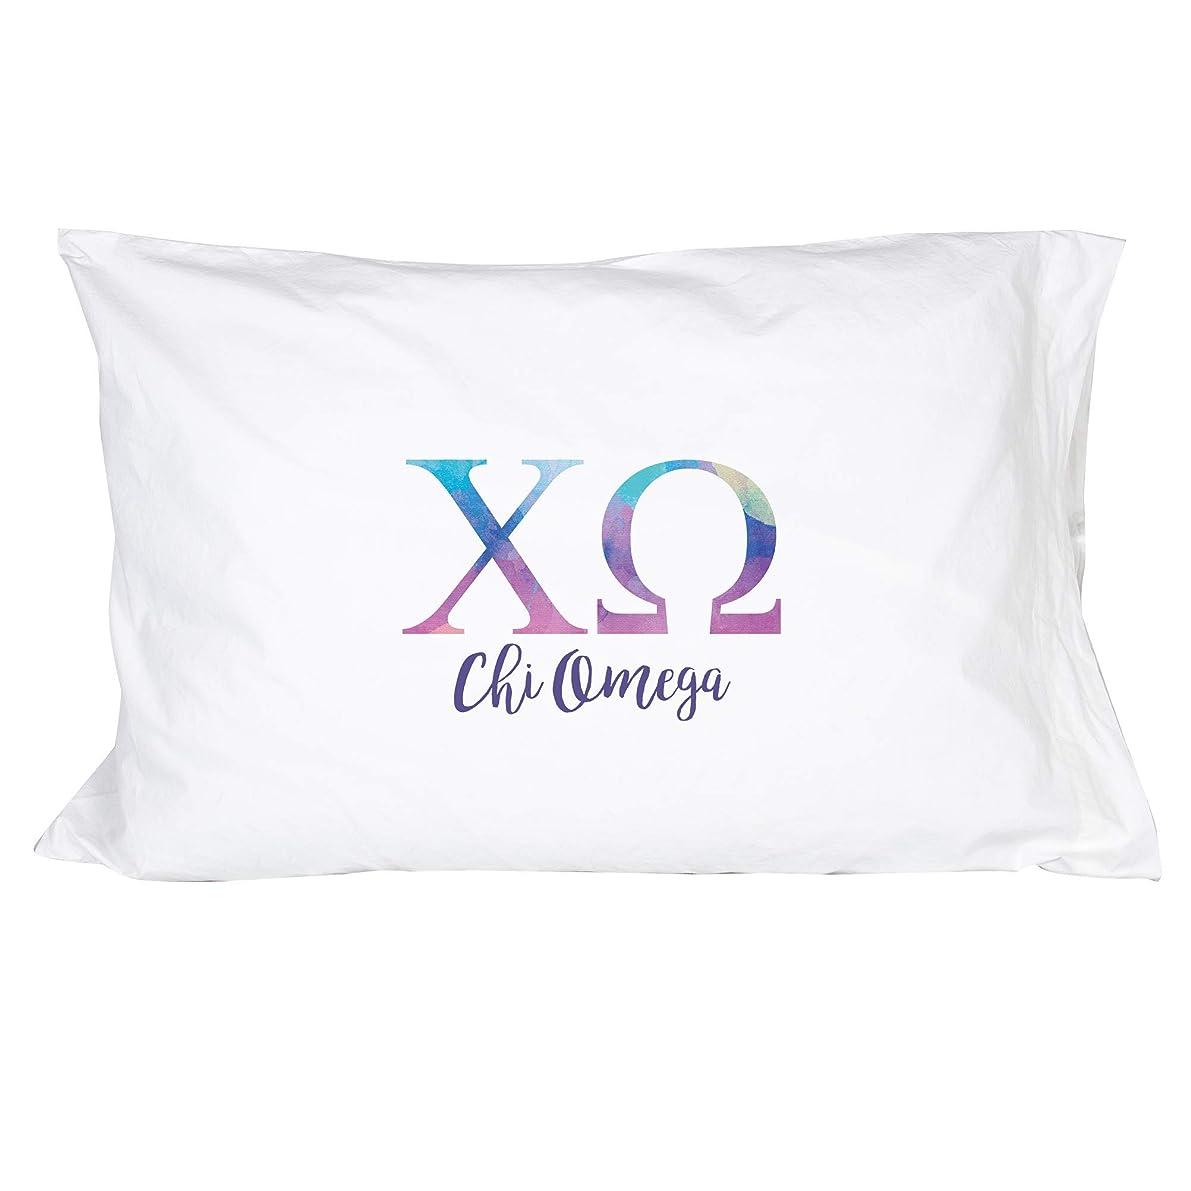 Desert Cactus Chi Omega Sorority Water Color Pillowcase 300 Thread Count 100% Cotton